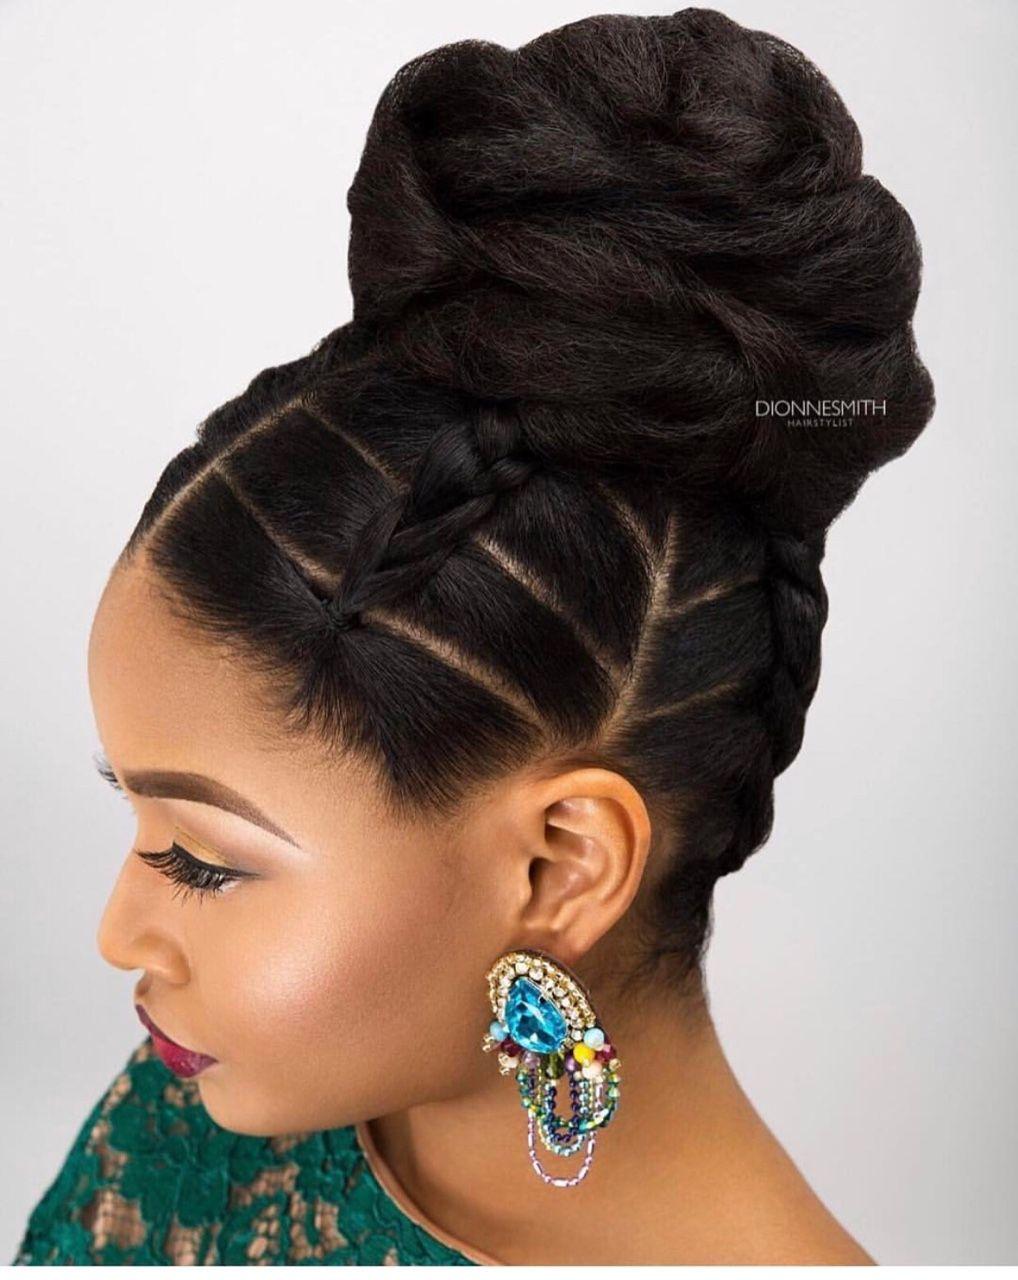 Simple But Elegant Follow For More Styles Yeahsexyweavestumblr